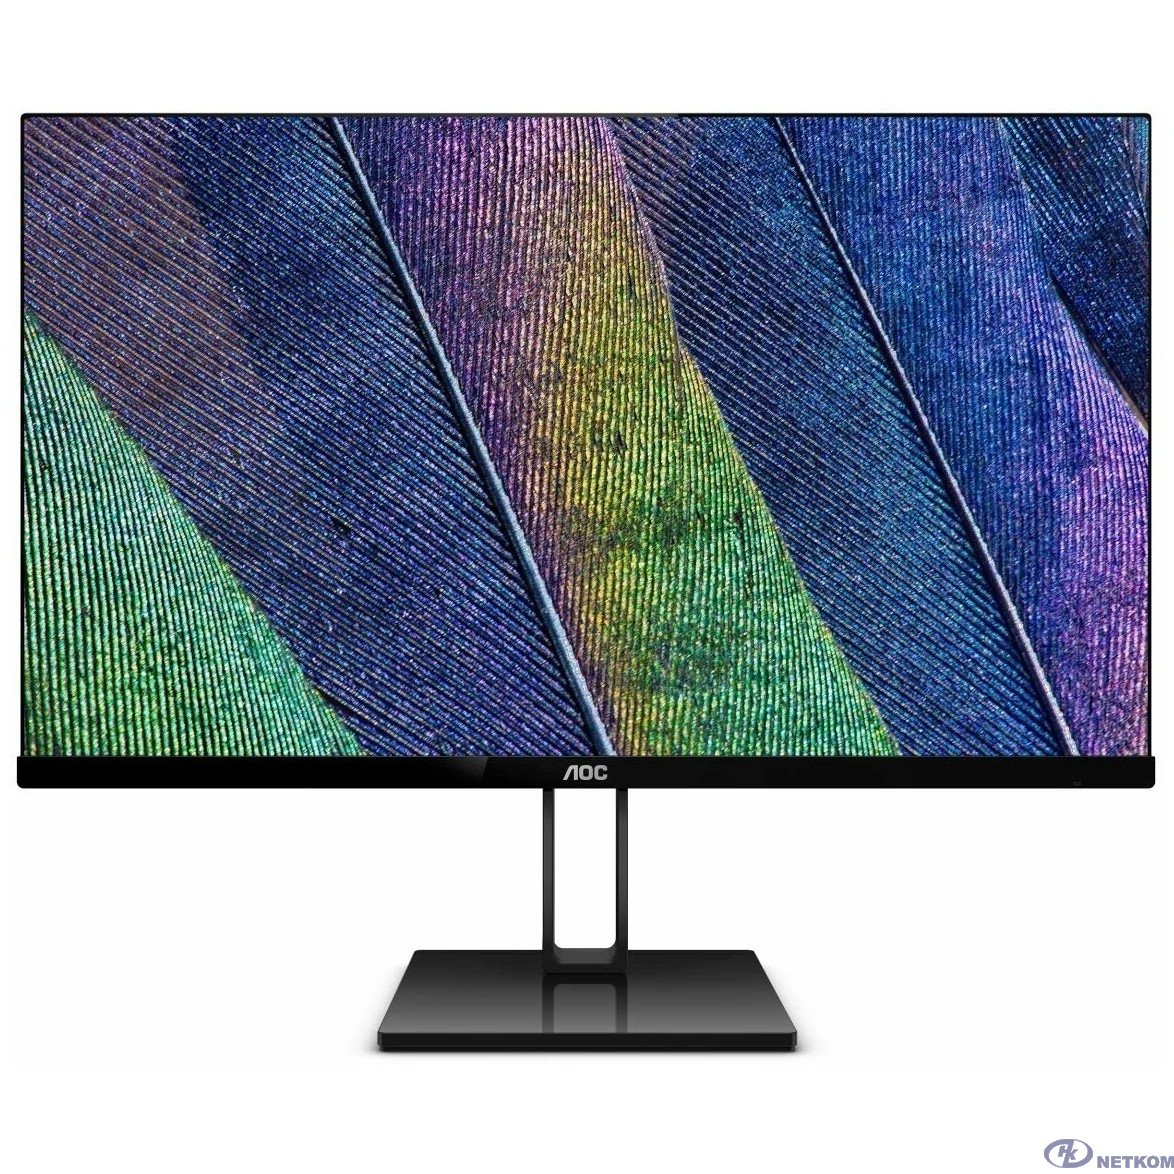 "LCD AOC 23.8"" 24V2Q черный {IPS 1920x1080 5ms 178/178 250cd 20M:1 HDMI(1.4) DisplayPort(1.2)}"